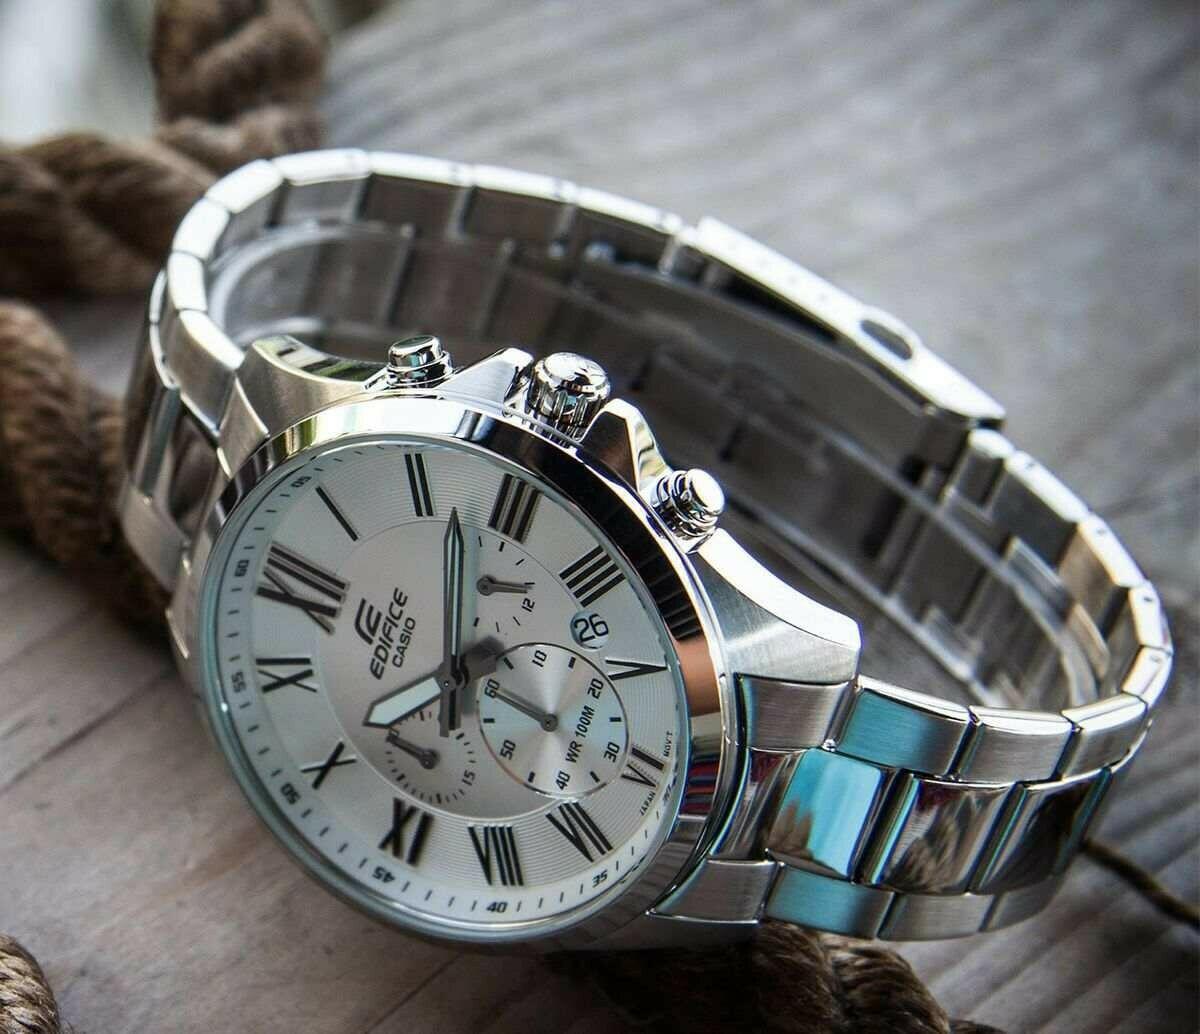 Casio Edifice EFV-500D-7AVUDF Analog Wrist Watch For Men - Silver